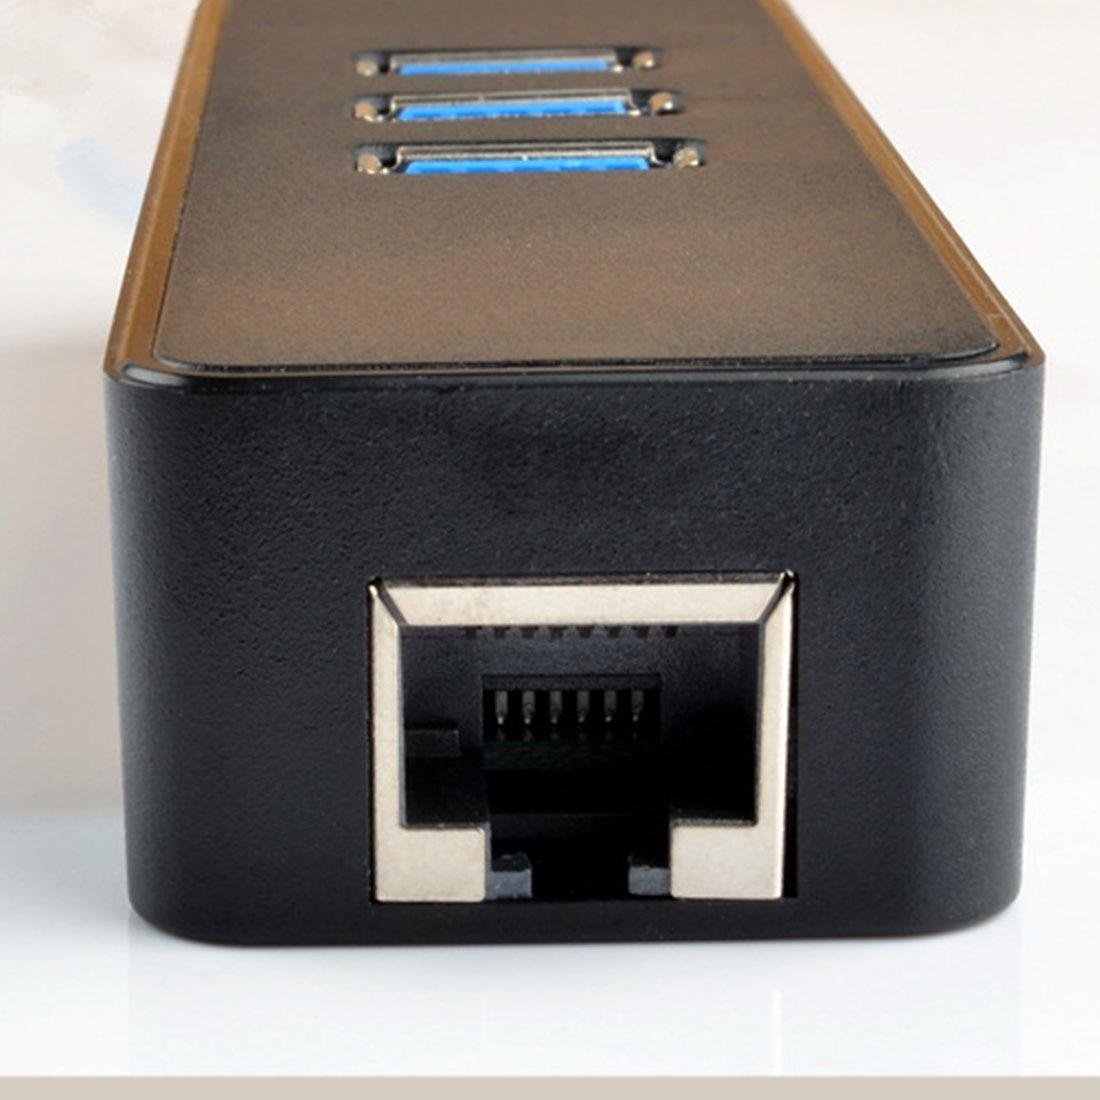 NOYOKERE USB 3.0 1000 Mbps Gigabit Ethernet Adapter USB ke Kartu - Peralatan jaringan - Foto 4